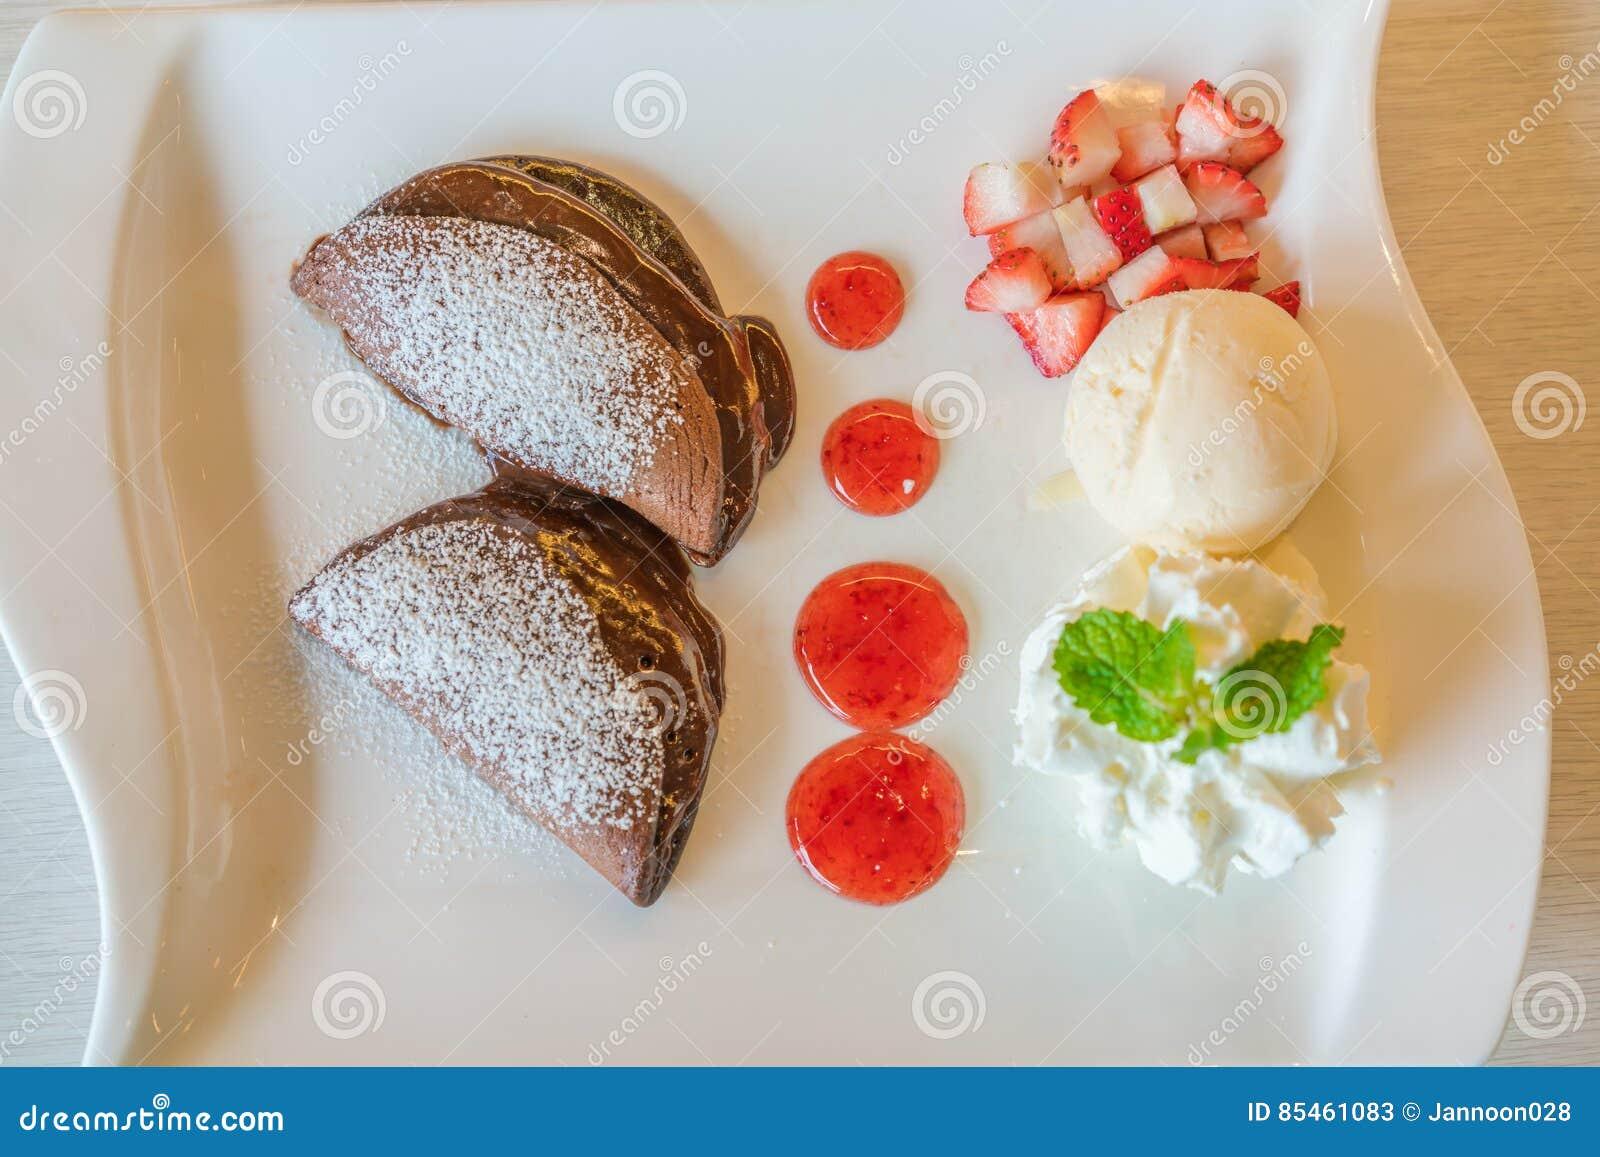 Blin i owoc z lody na stole